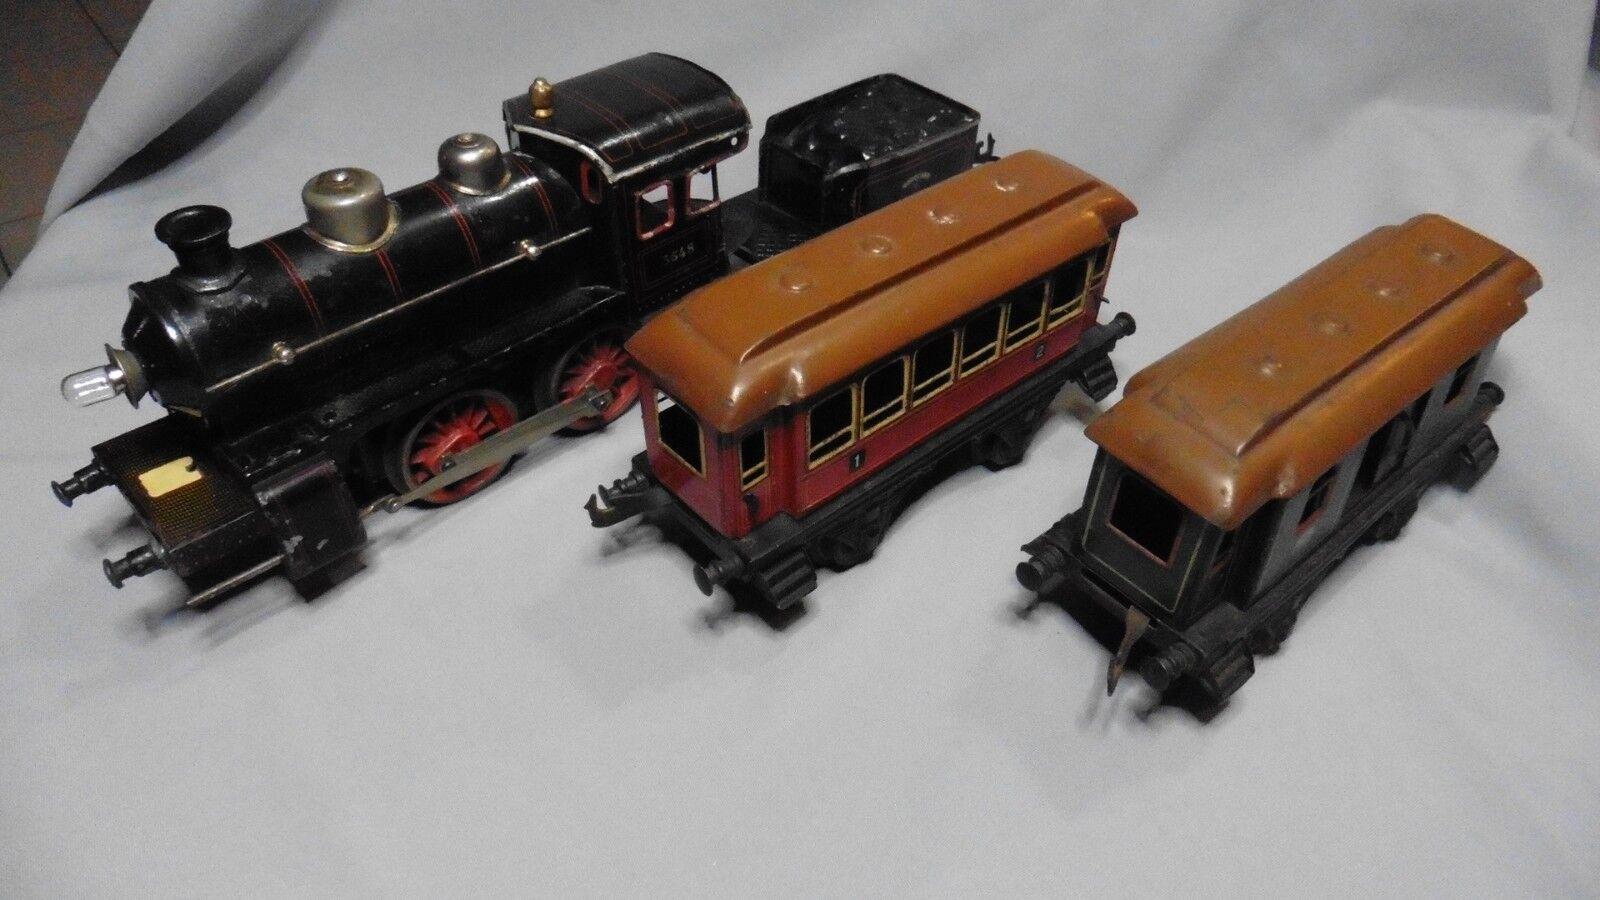 Aj567 bing locomotive steam wagon 3548 ext. 520 car passenger steam